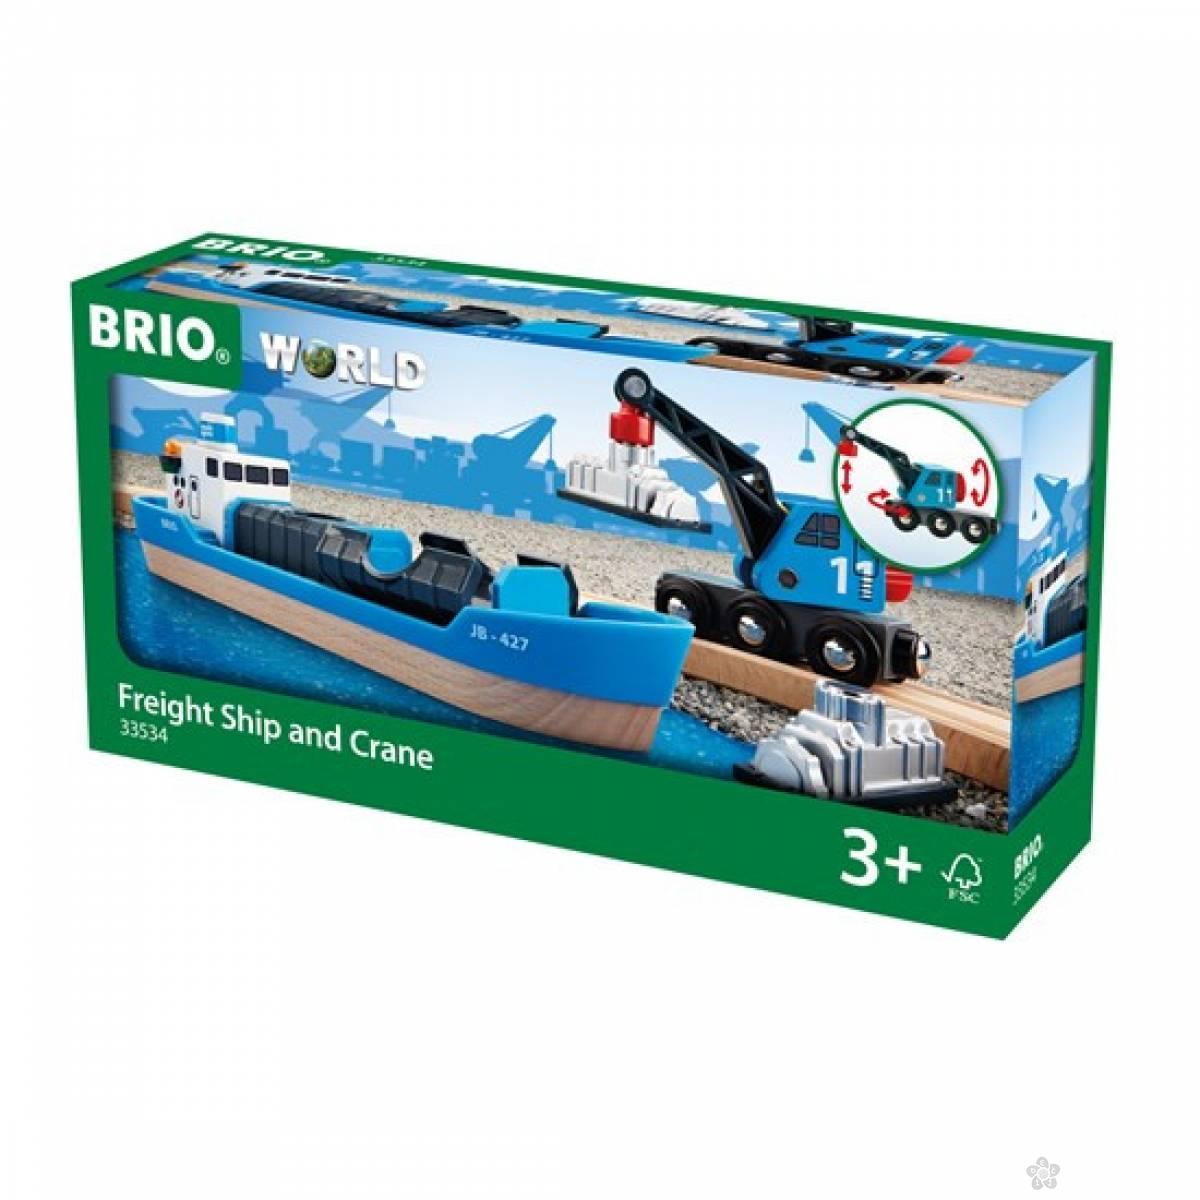 Konterjner i dizalica Brio BR33534